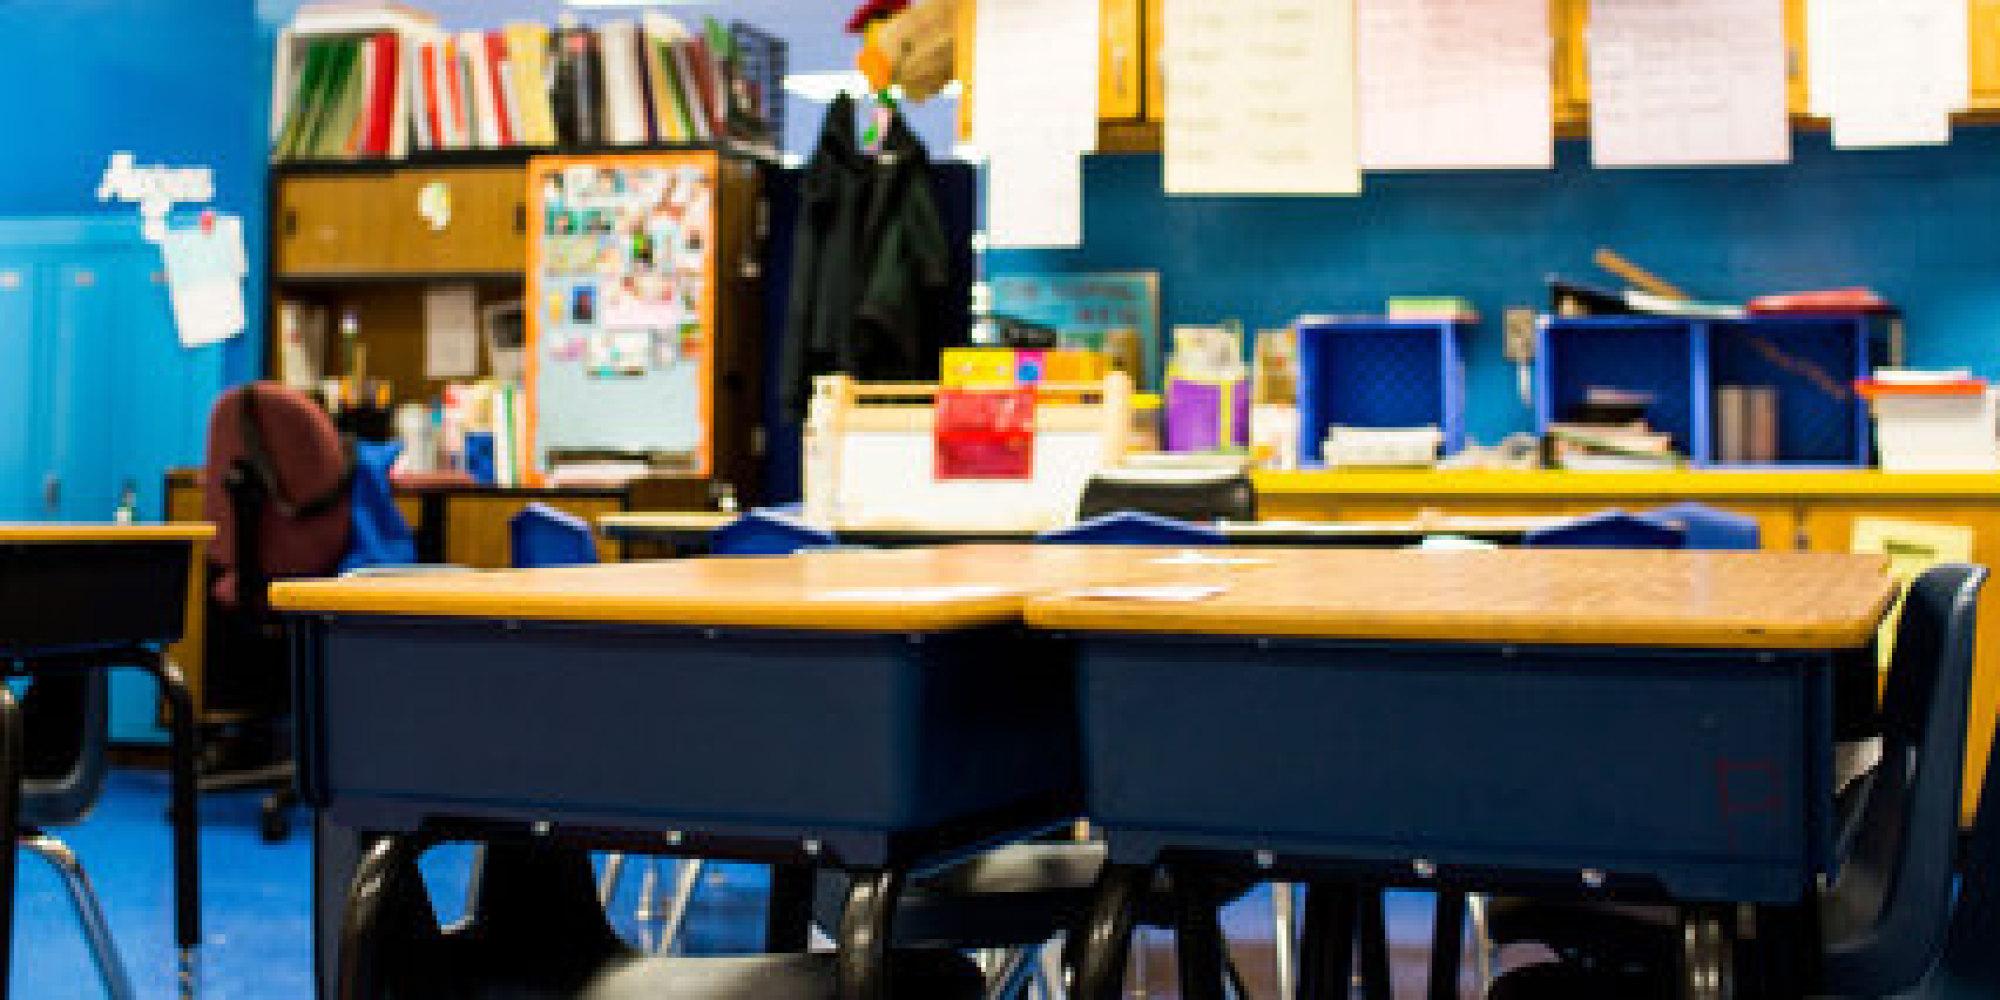 academia and classroom